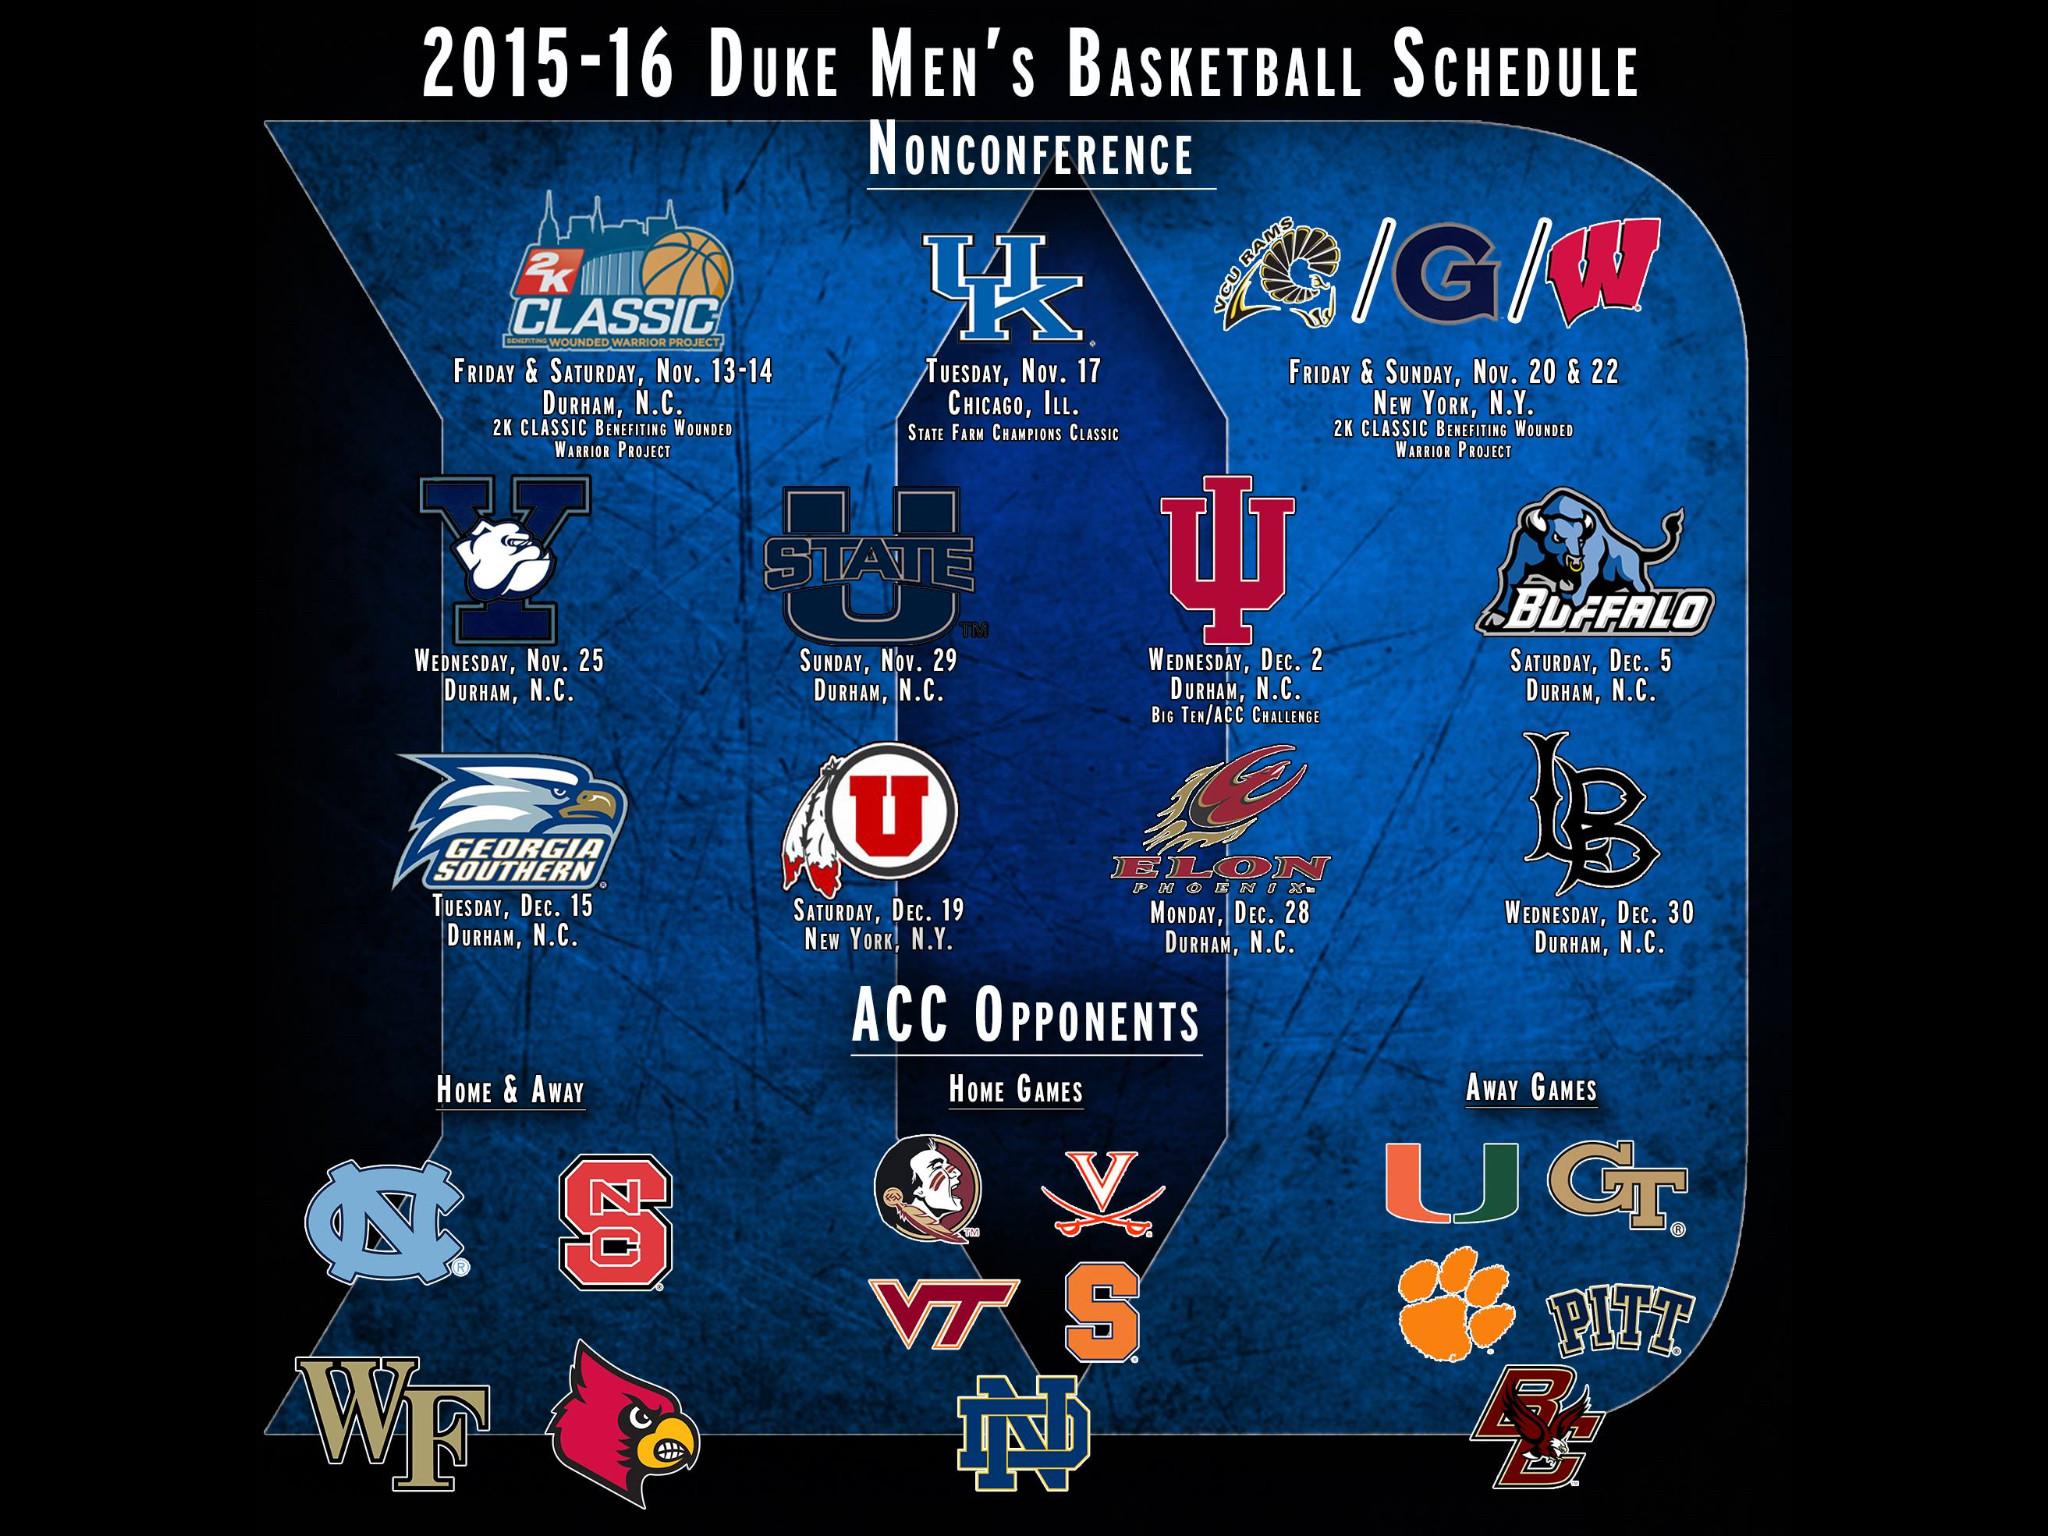 Best 25+ Duke basketball schedule 2016 ideas only on Pinterest | Duke mens  basketball schedule, Duke basketball schedule and Duke blue planet